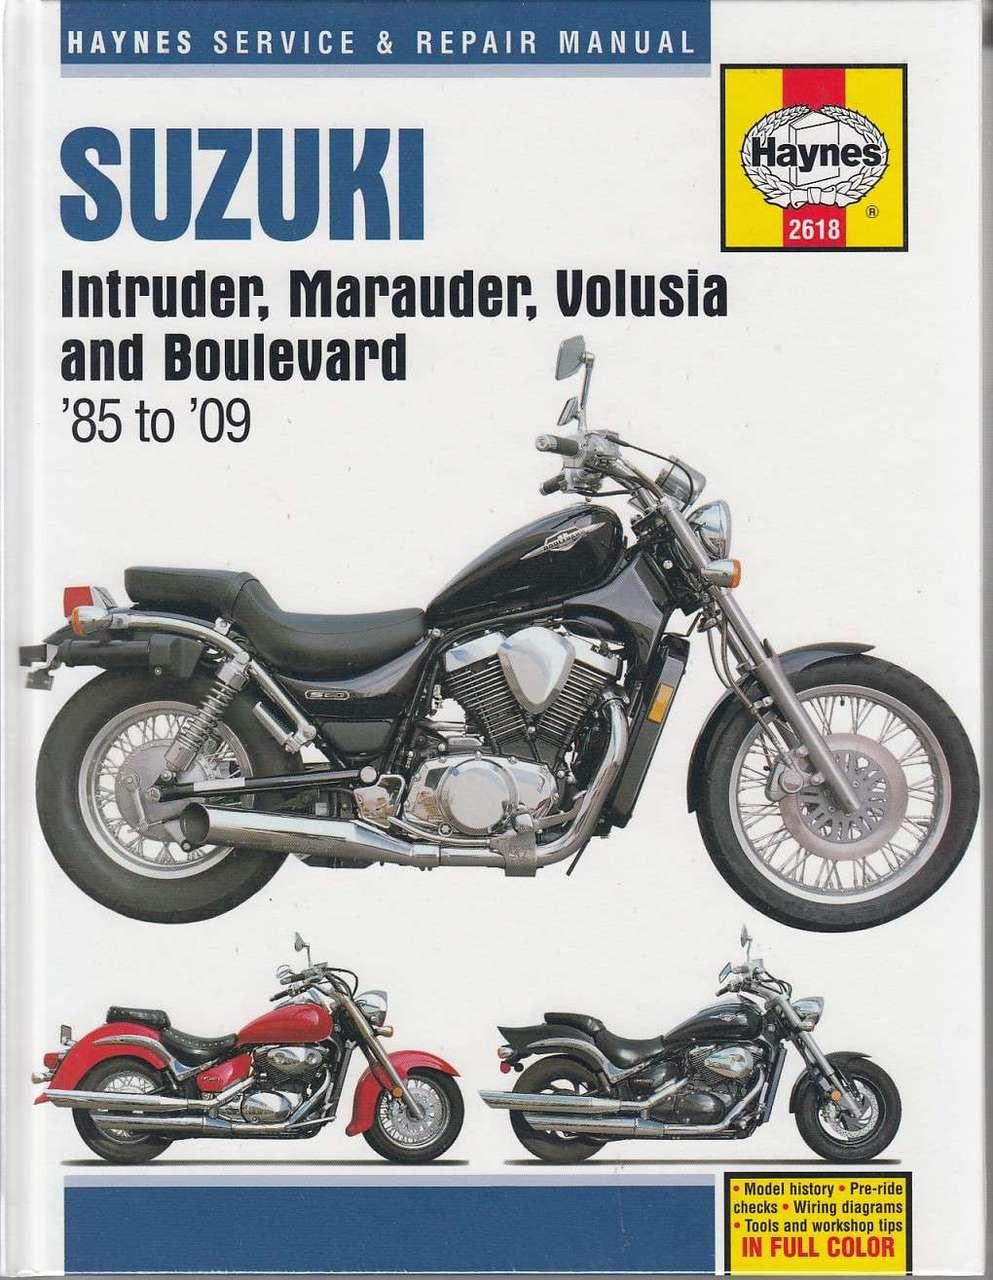 suzuki intruder marauder volusia and boulevard 1985 2009 rh automotobookshop com au Suzuki VL250 Intruder suzuki vl 250 workshop manual